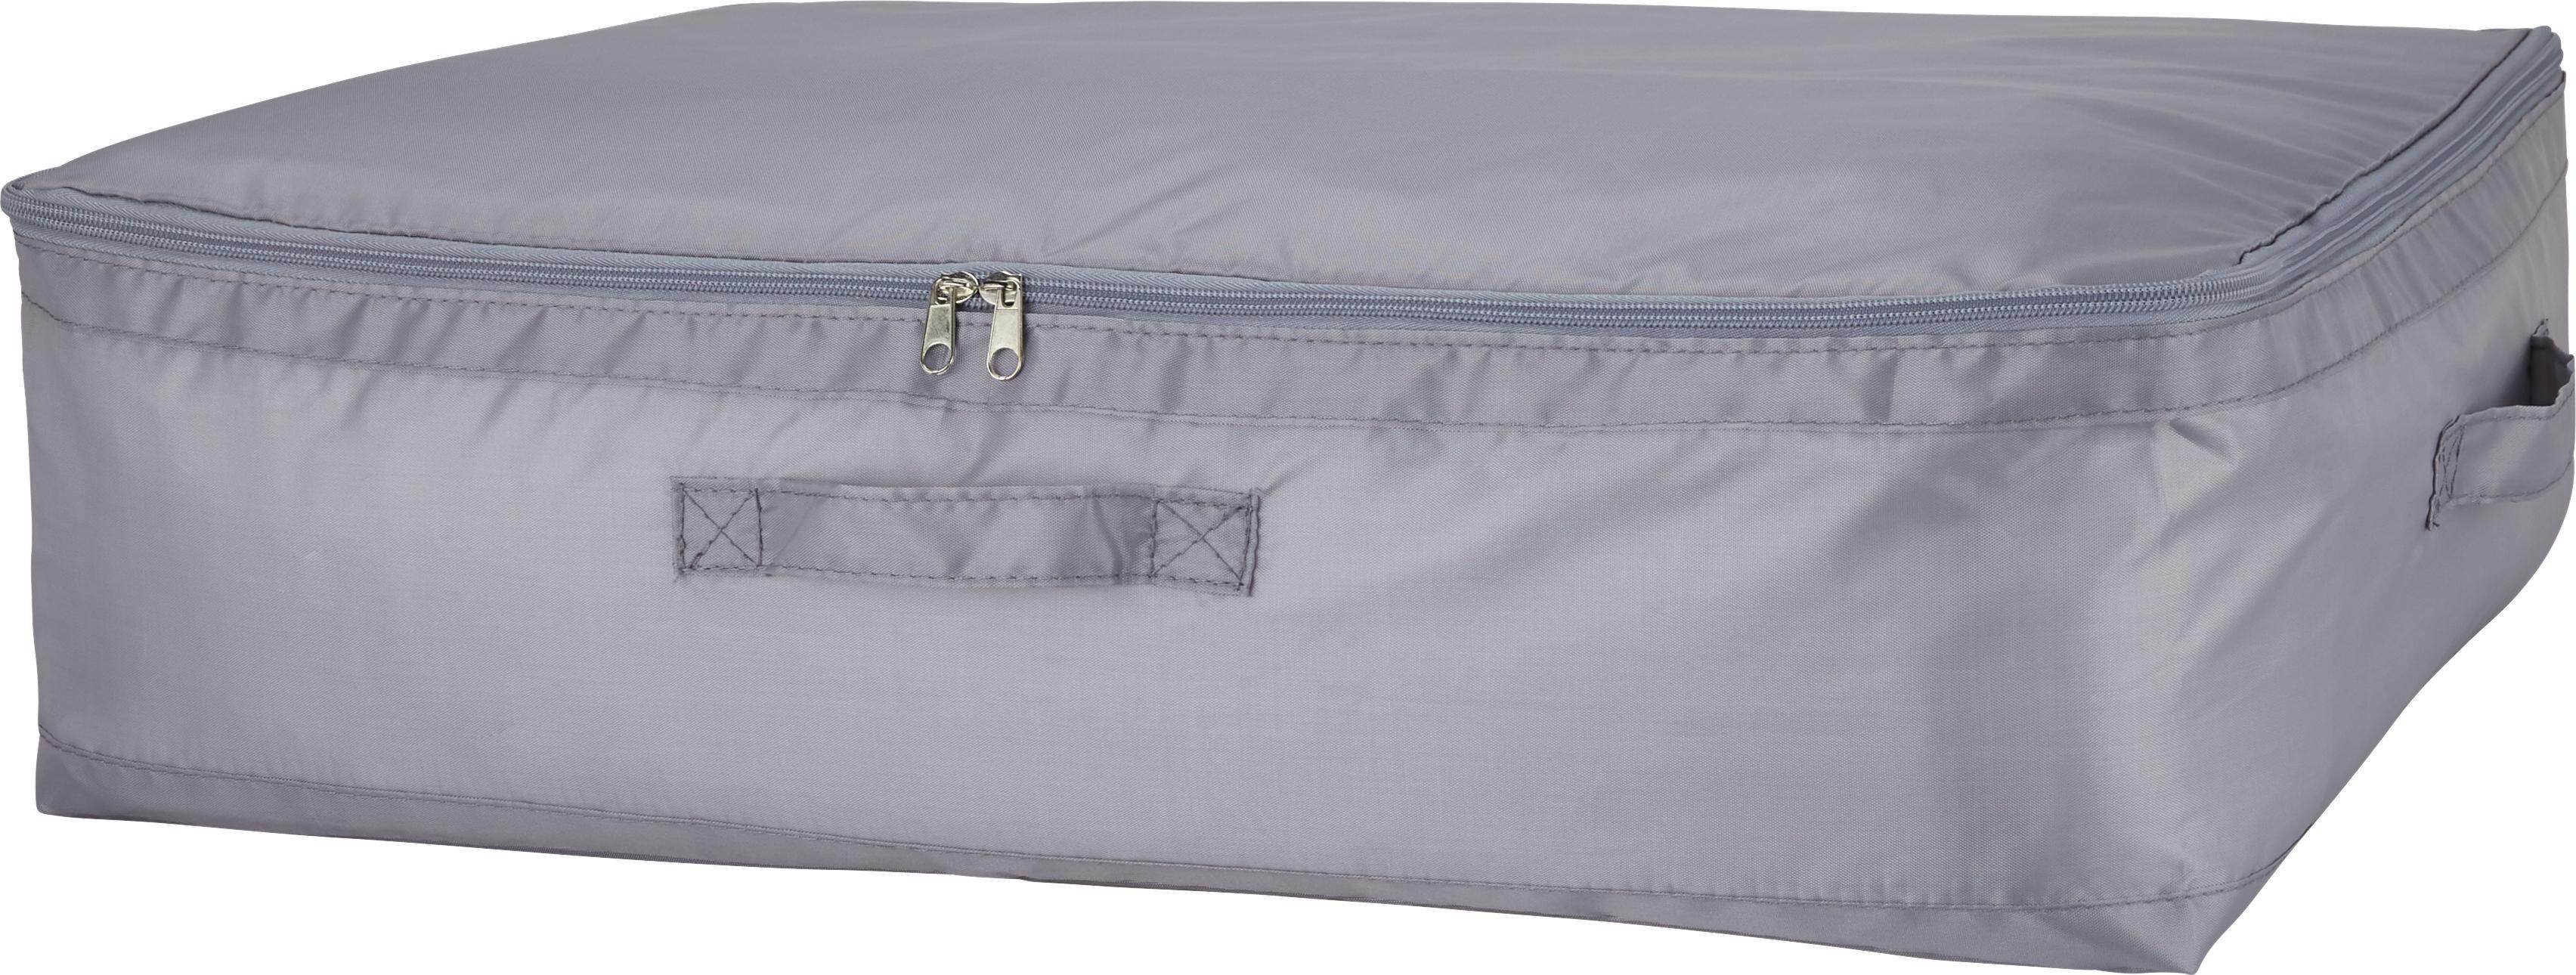 Aufbewahrungsbox Kläck in Grau - Grau, KONVENTIONELL, Kunststoff (60/45/18cm) - MÖMAX modern living